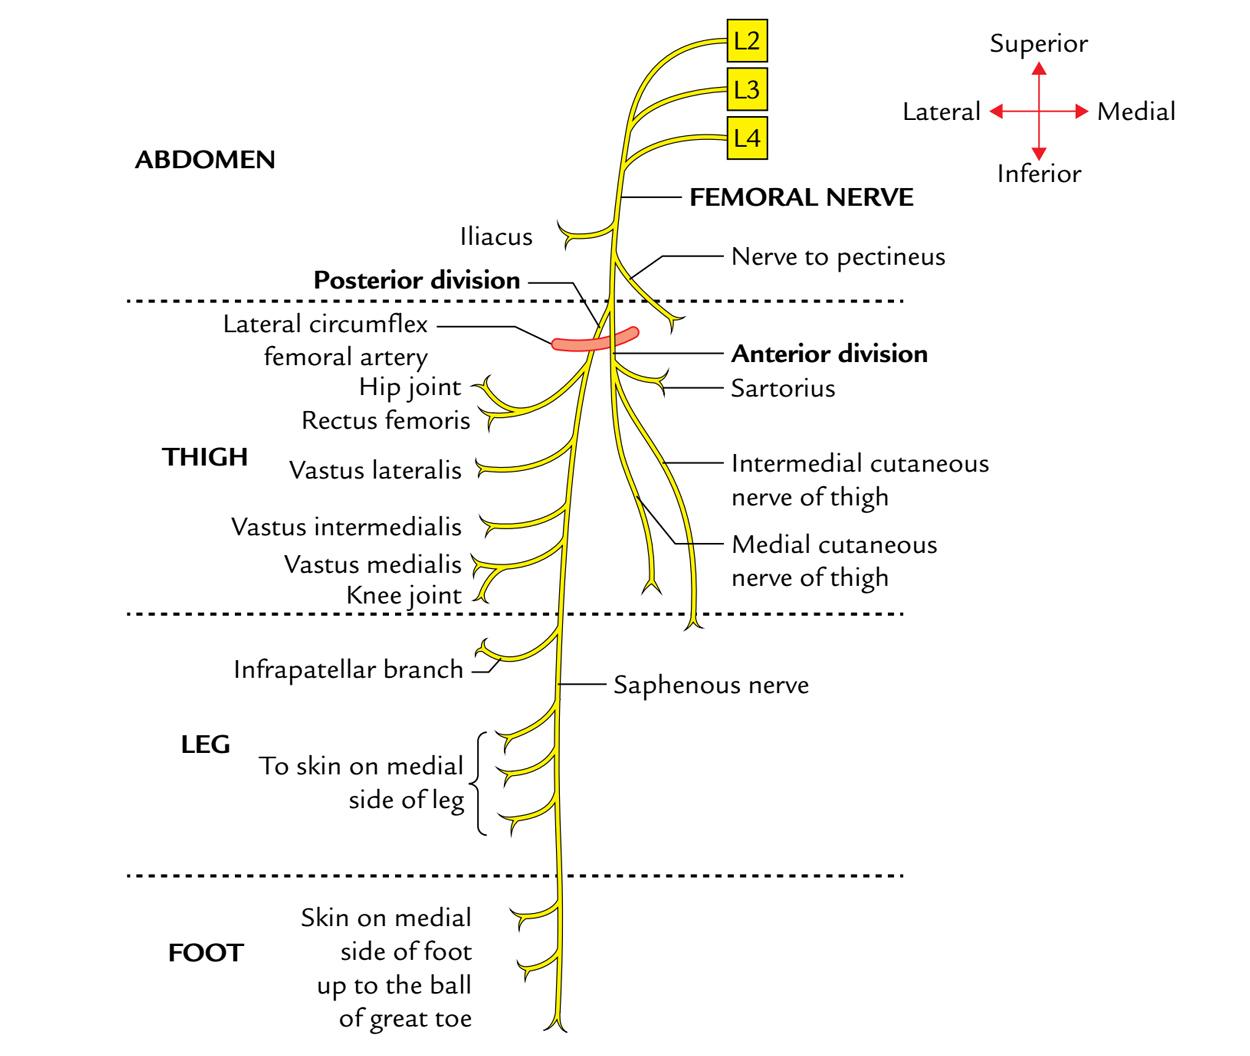 Femoral Nerve: Branches